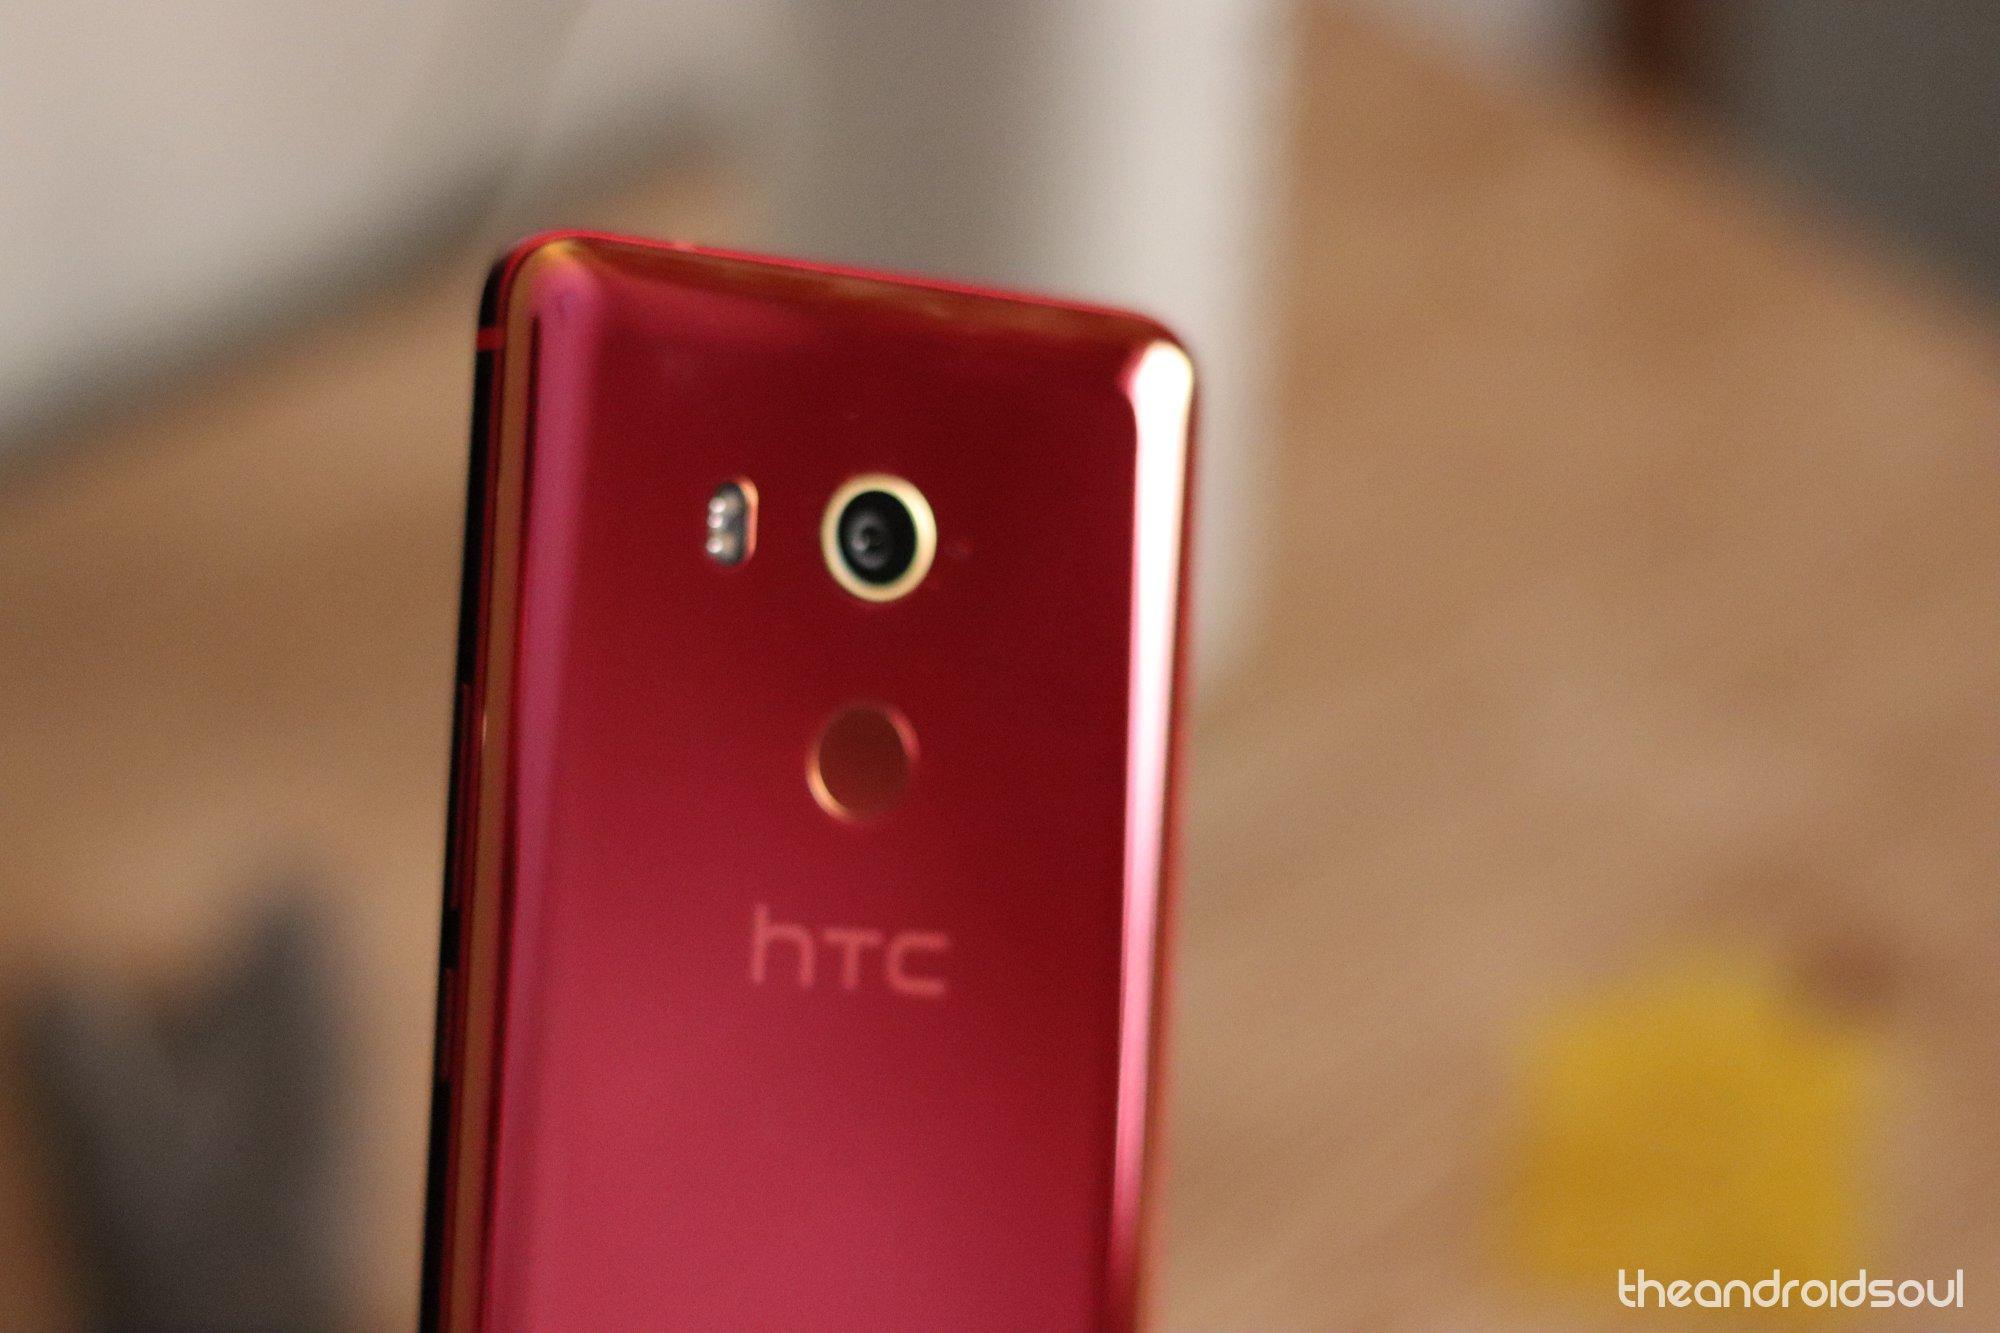 HTC-U11-EYEs-image-213